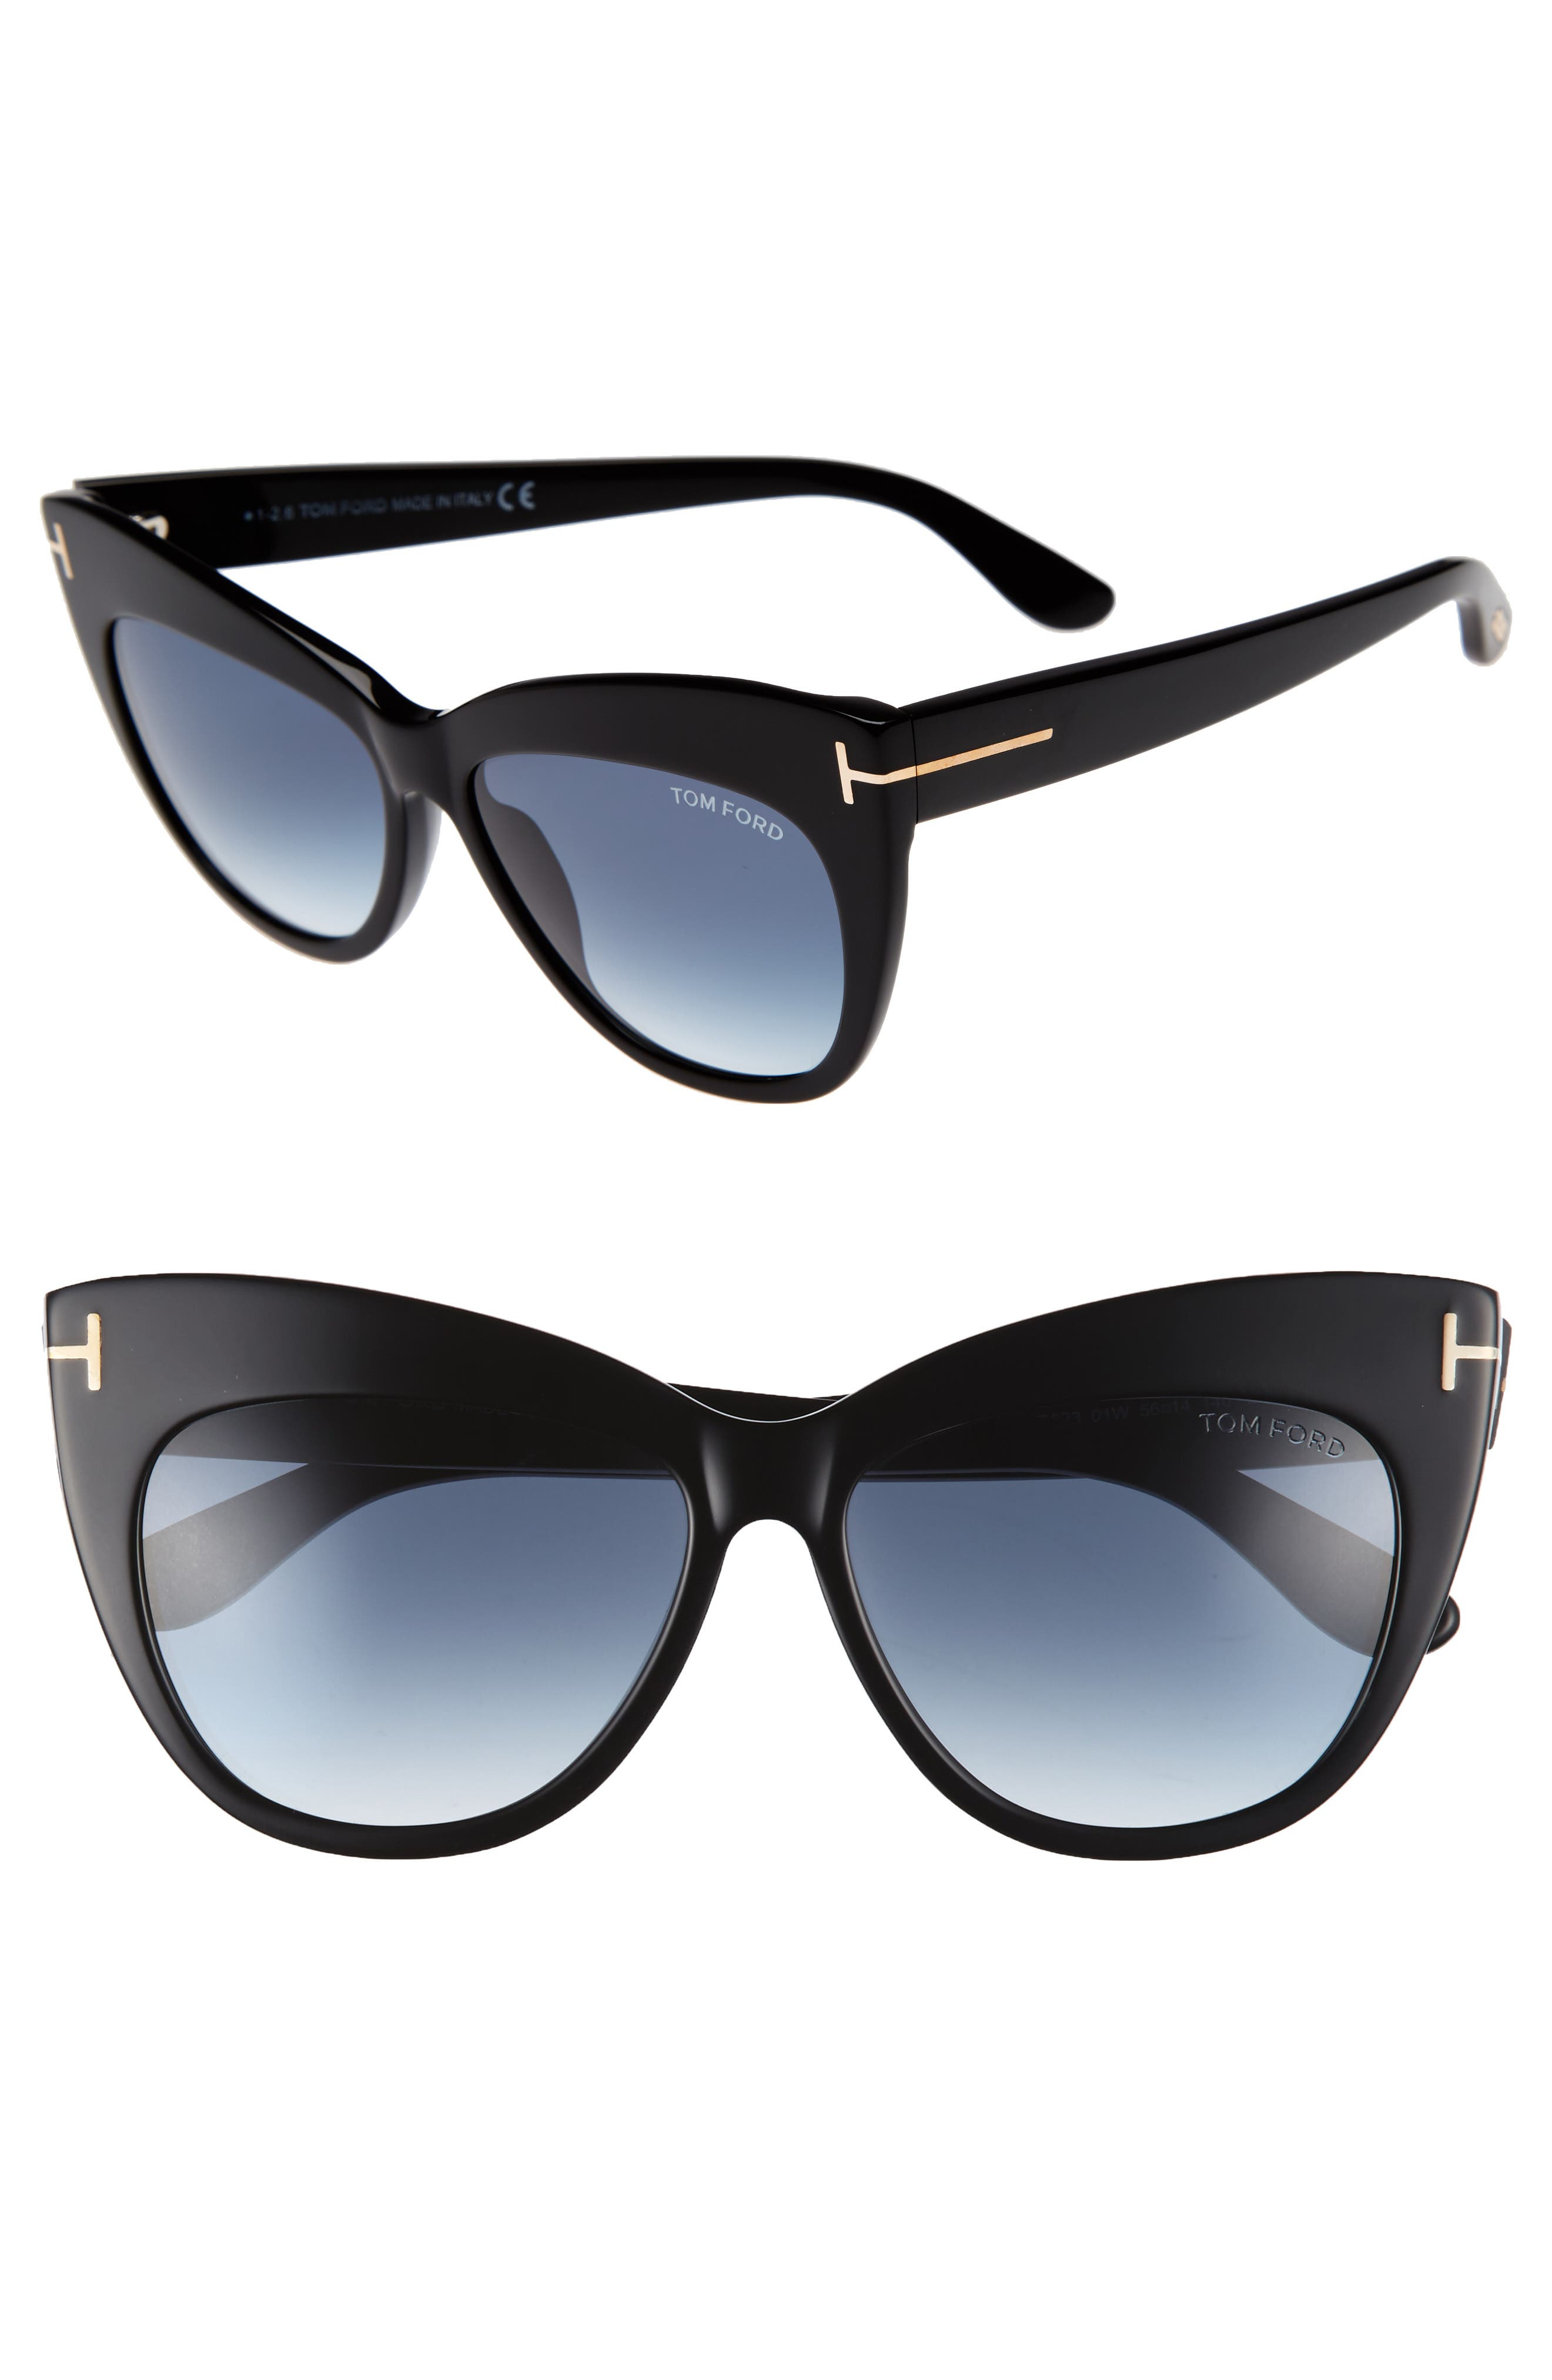 Nika 56mm Gradient Cat Eye Sunglasses,                         Main,                         color, Shiny Black/ Gradient Blue